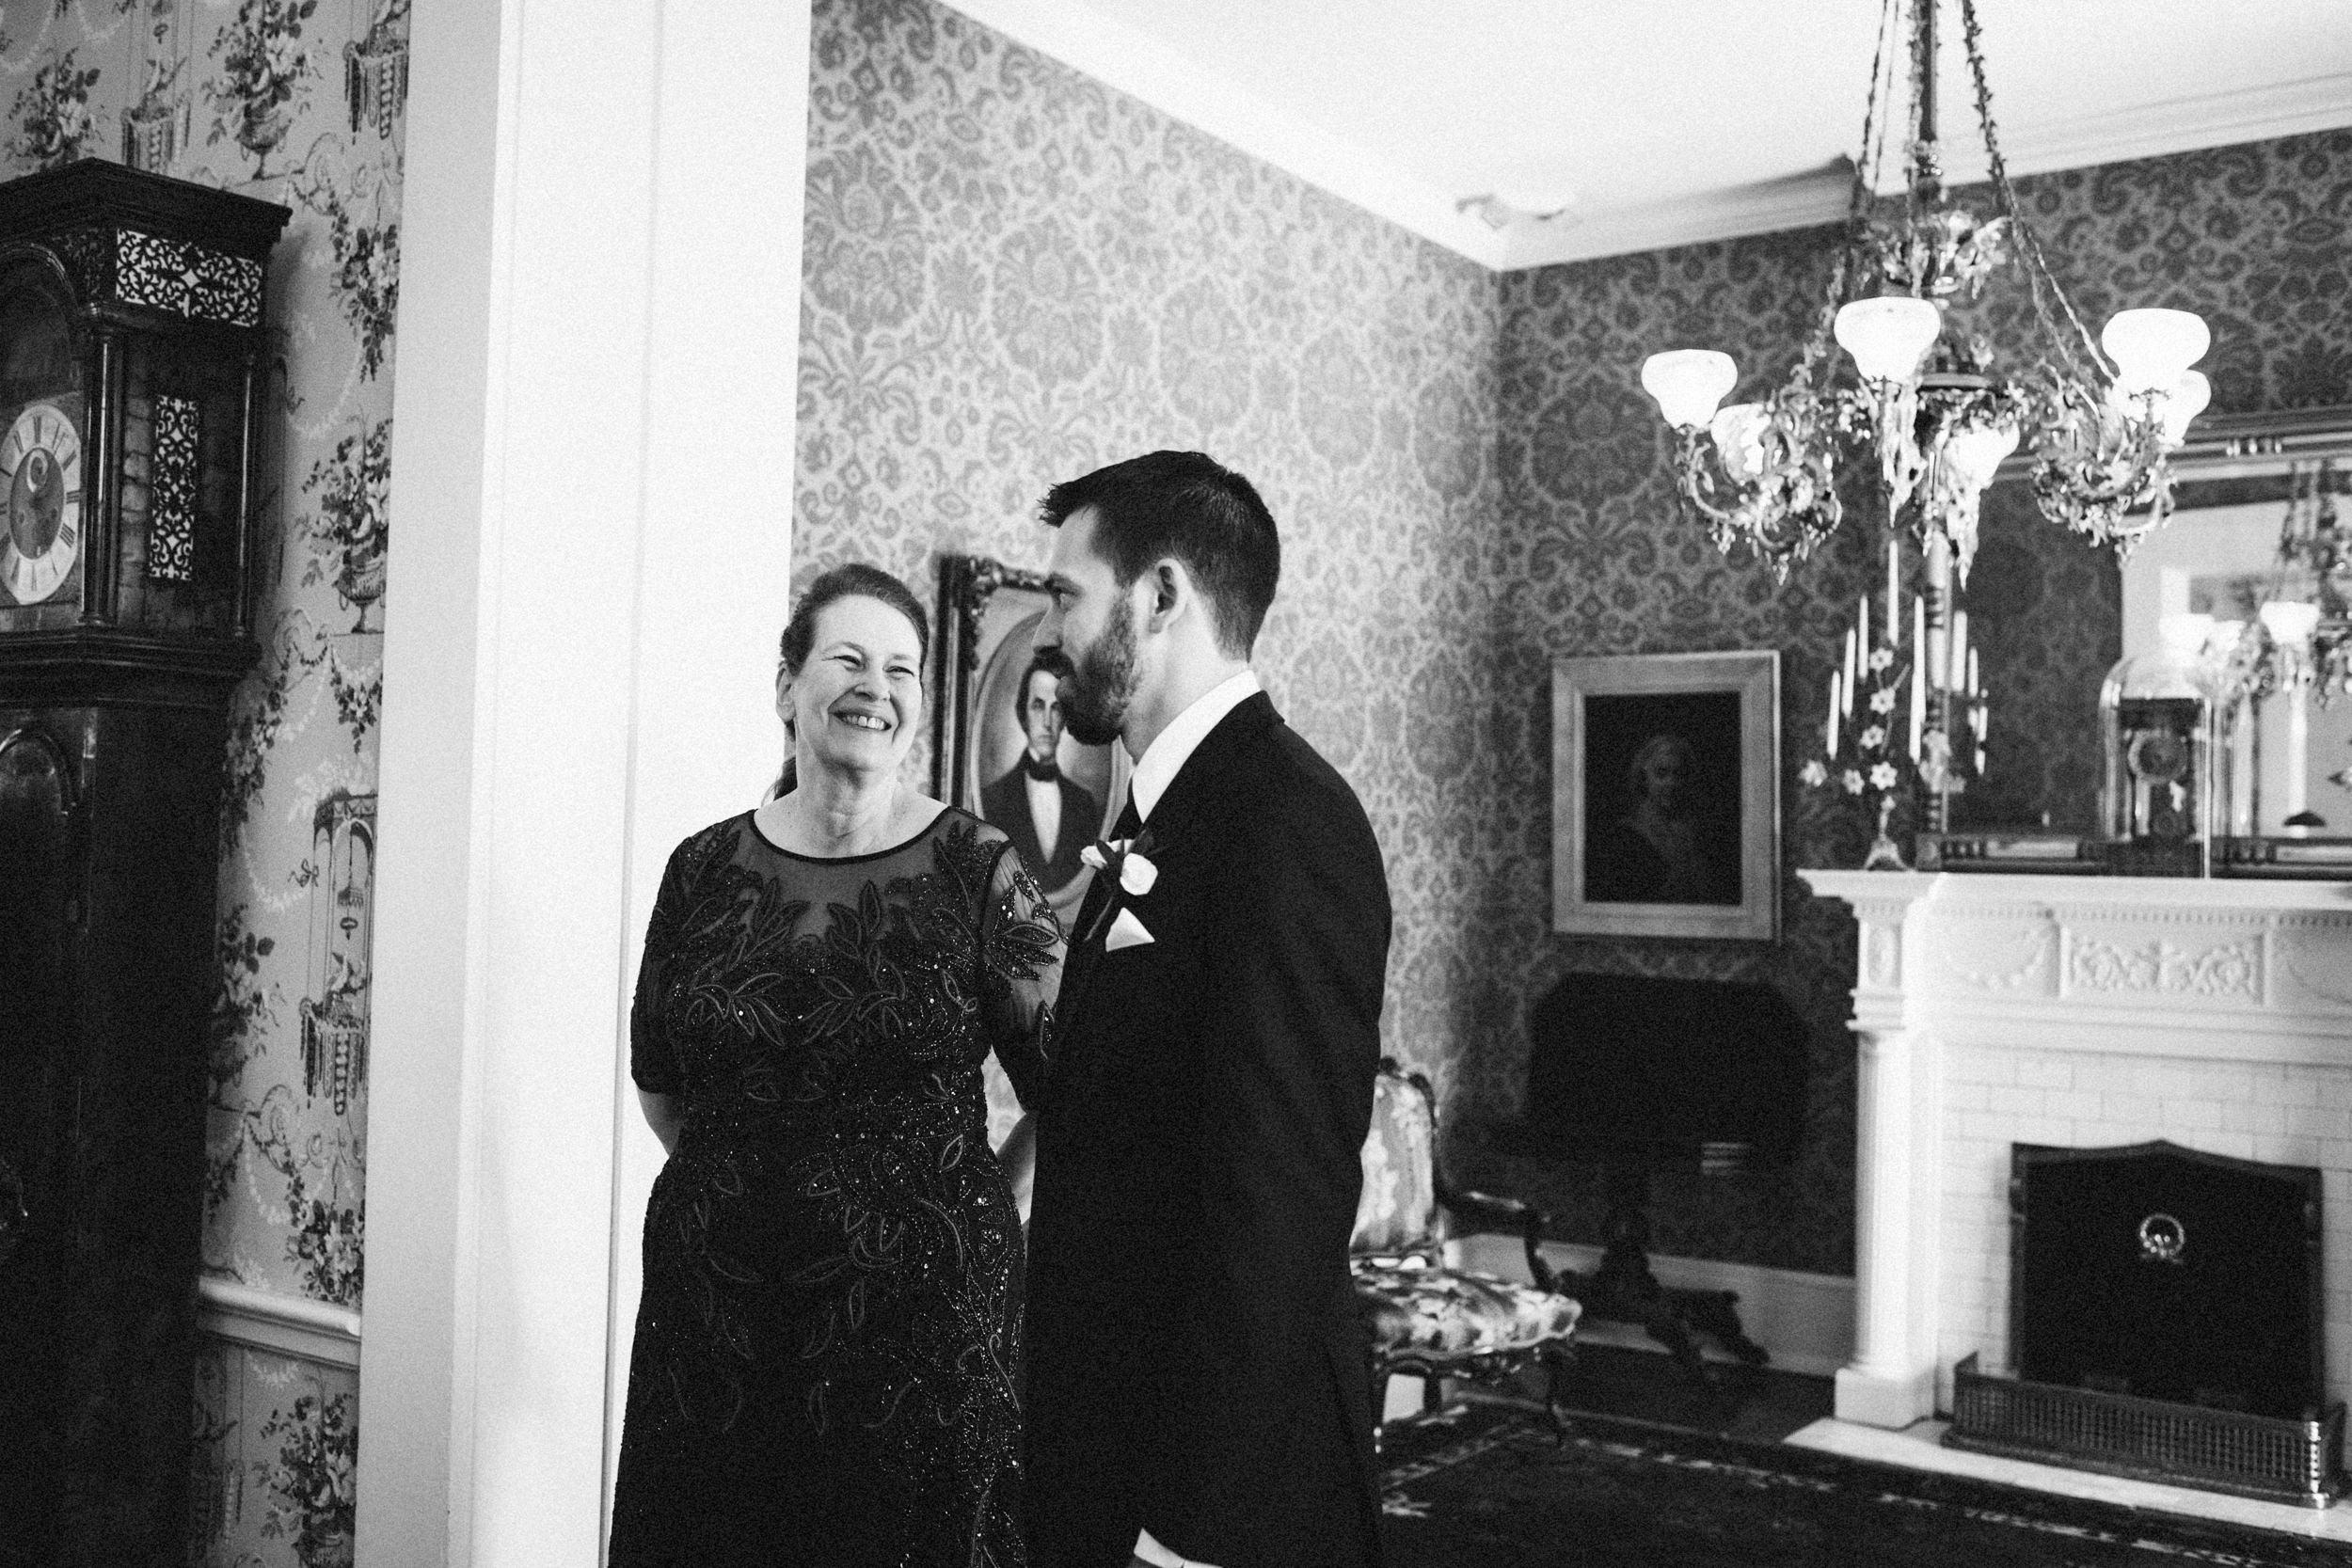 Louisville-Kentucky-Wedding-Elopement-Photographer-Sarah-Katherine-Davis-Photography-Whitehall-Classic-Timeless-Garden-Wedding-67.jpg